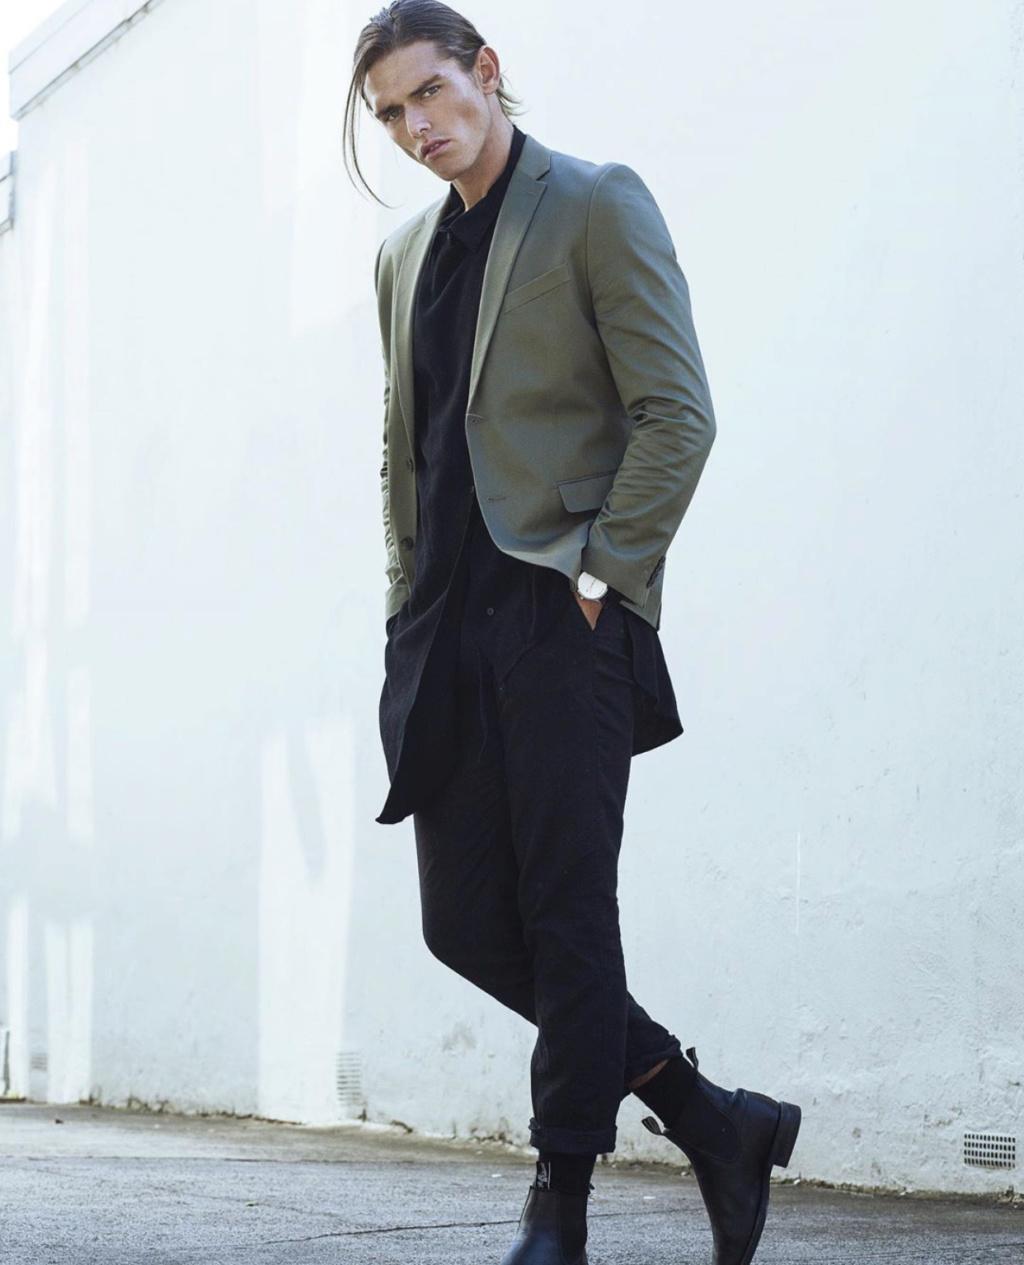 Timm Hanly - Timm The Magnificent - Bachelorette Australia - Season 5 - Fan Thread F2eefd10